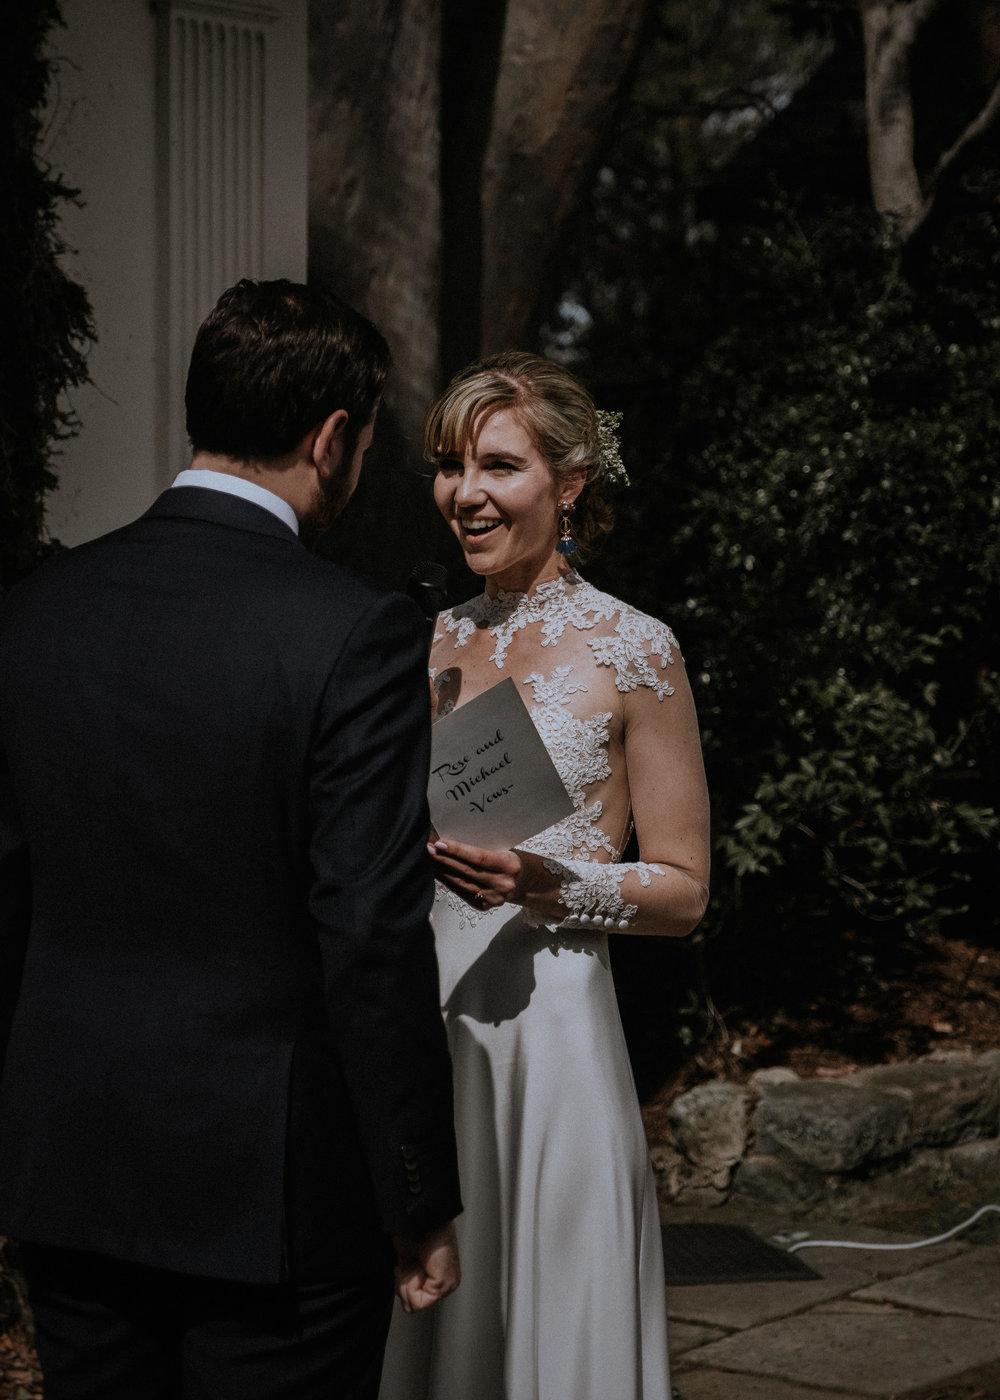 R+M_elopement wedding photography_kings & thieves_blog (152 of 326).jpg